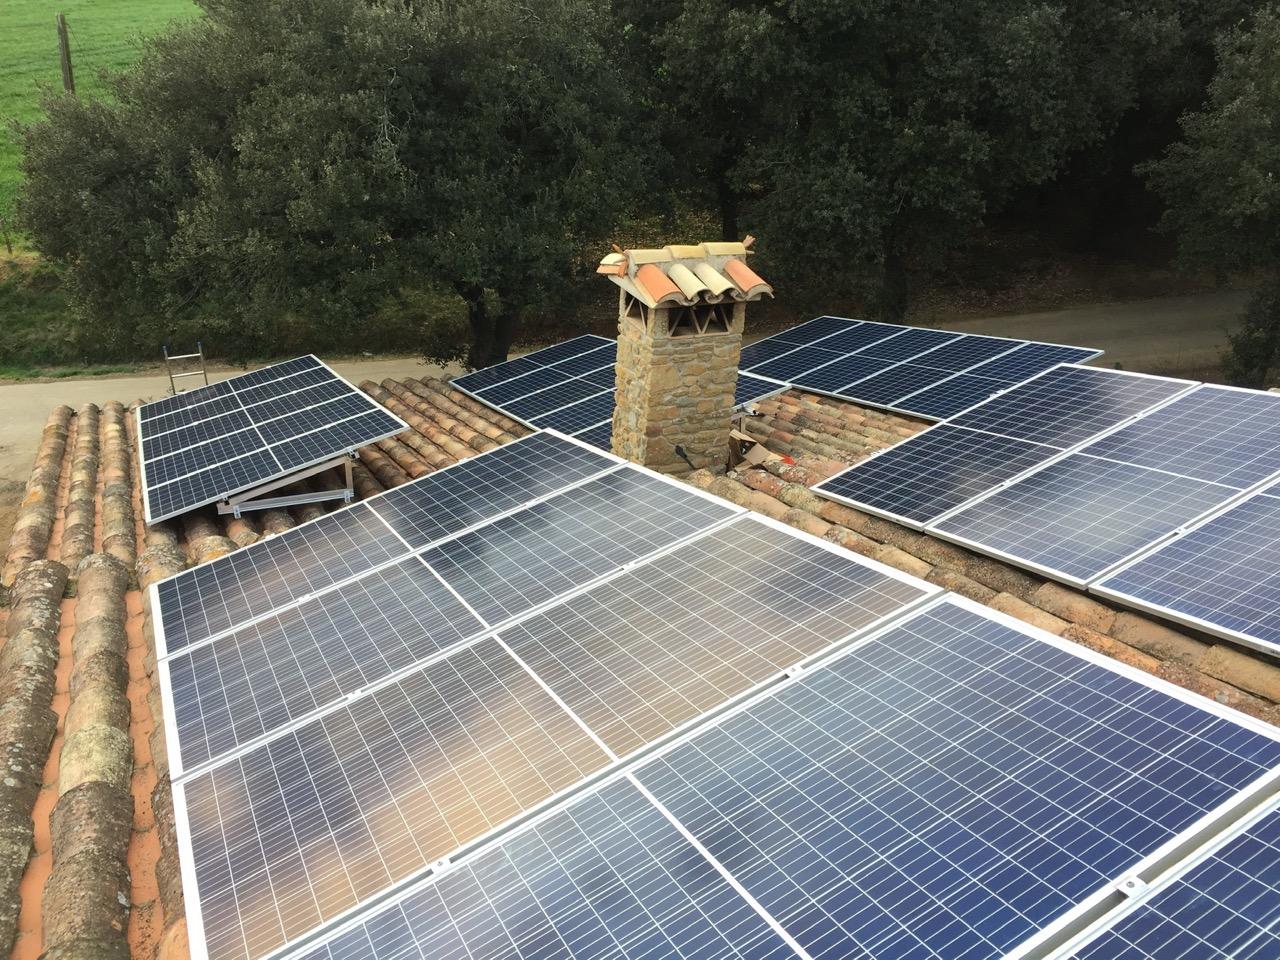 Instal·lació residencial – 10'5 kWp